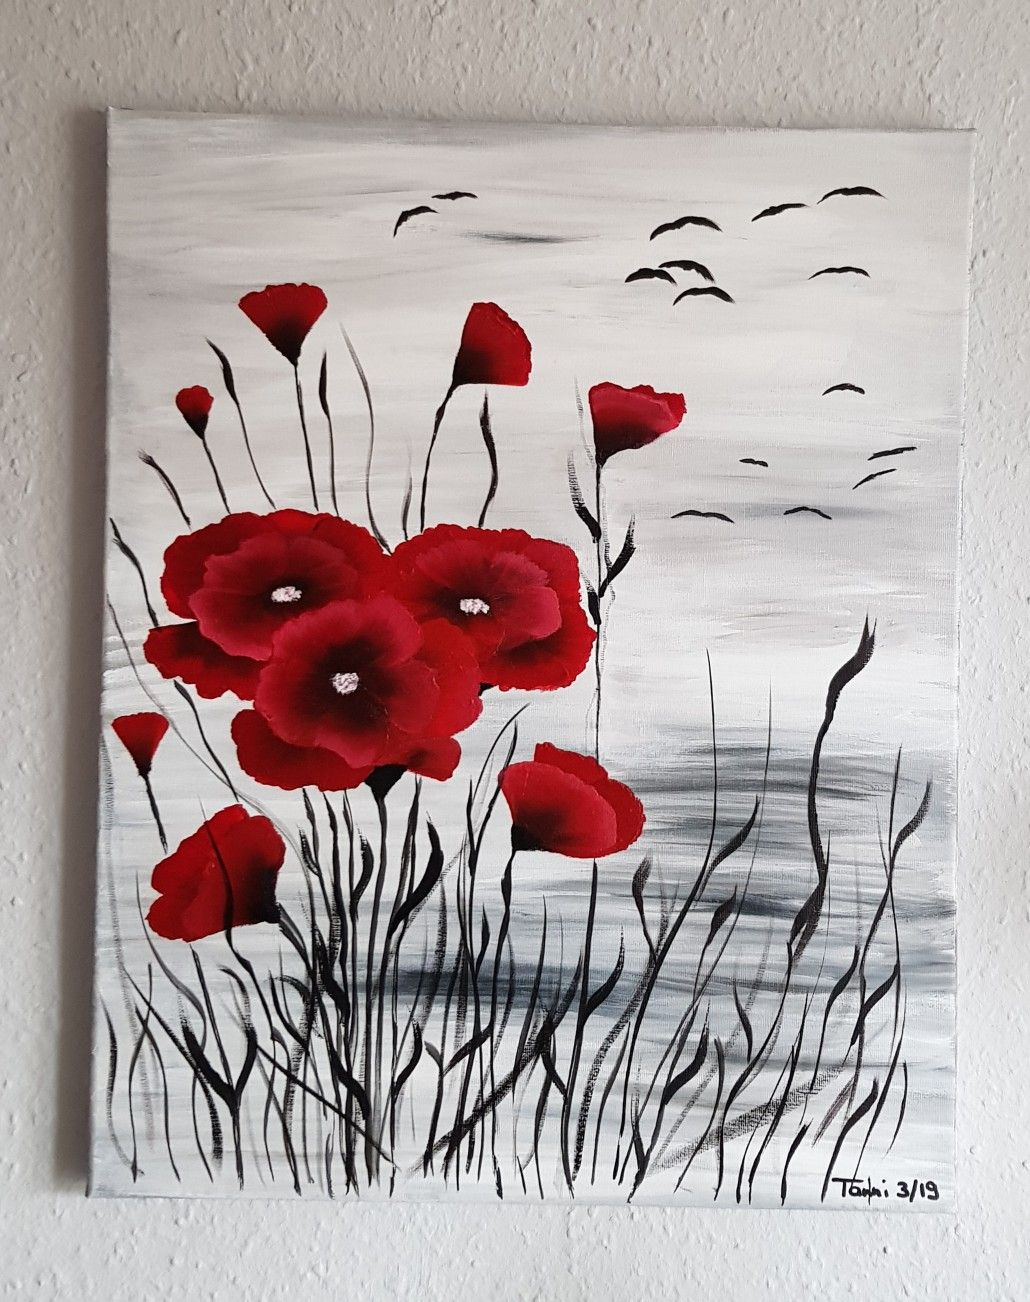 Mohnblumen Acryl Auf Leinwand Peinture Fleurs Aquarelle Chat Peinture